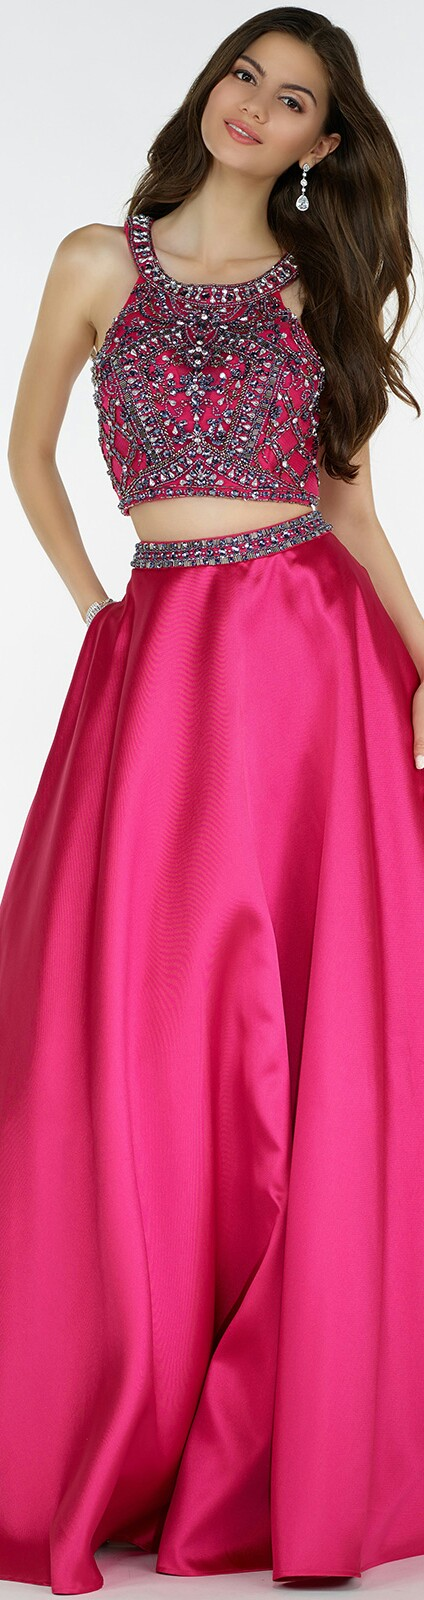 ALYCE PARIS ¤ In Fuchsia Flowing Satin Skirt has Pockets & Beaded ...